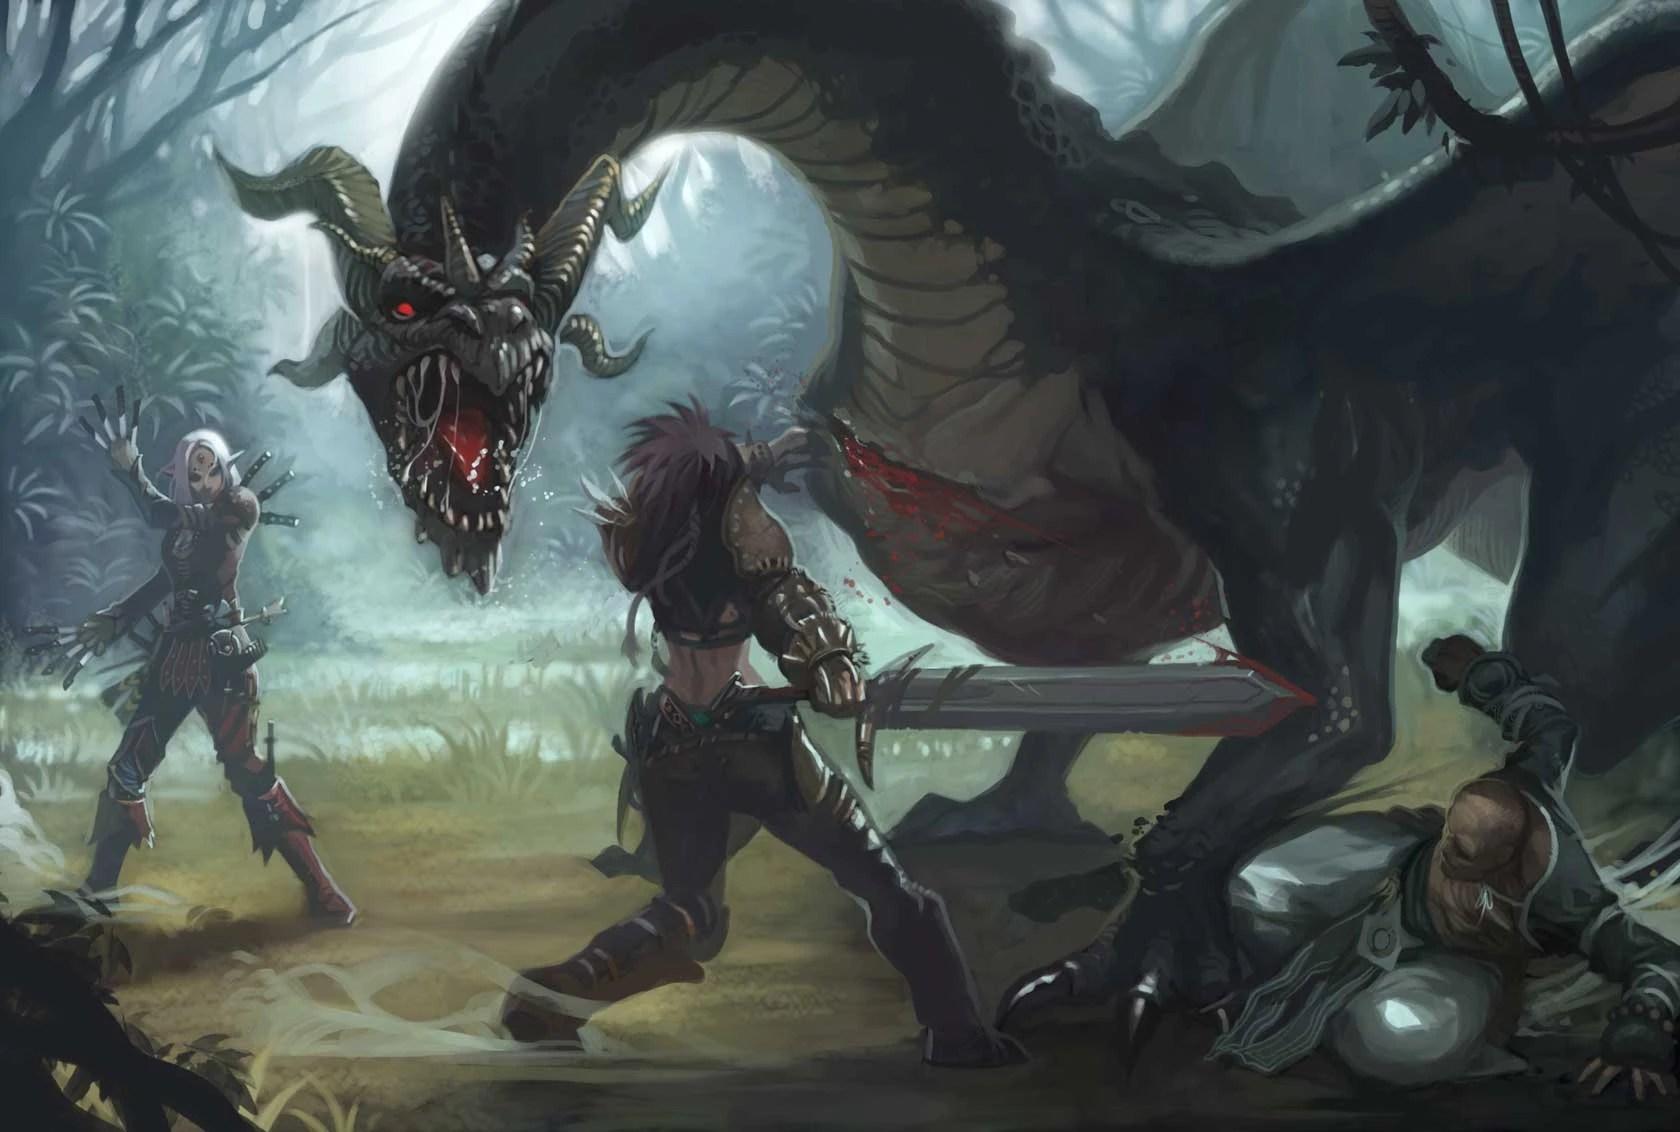 Image Black Dragon Fightjpg Pathfinder Wiki FANDOM